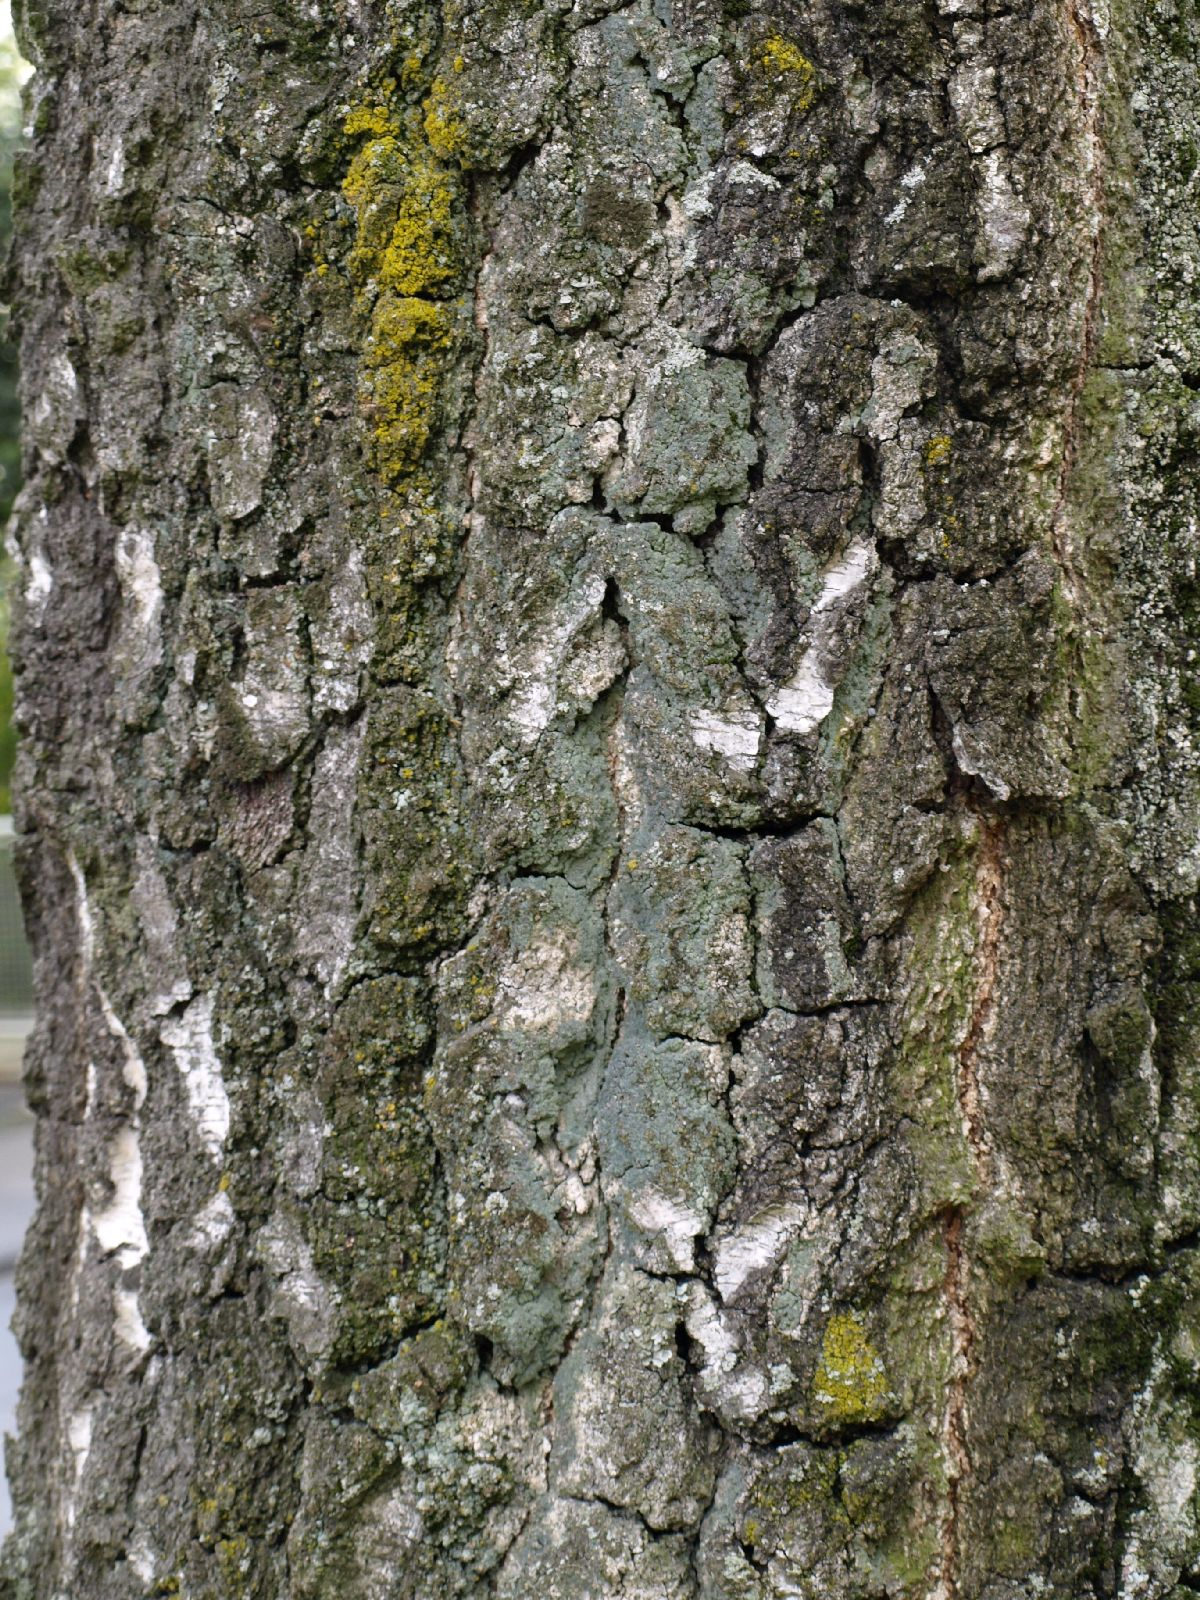 Baum-Rinde_Textur_A_P4120903